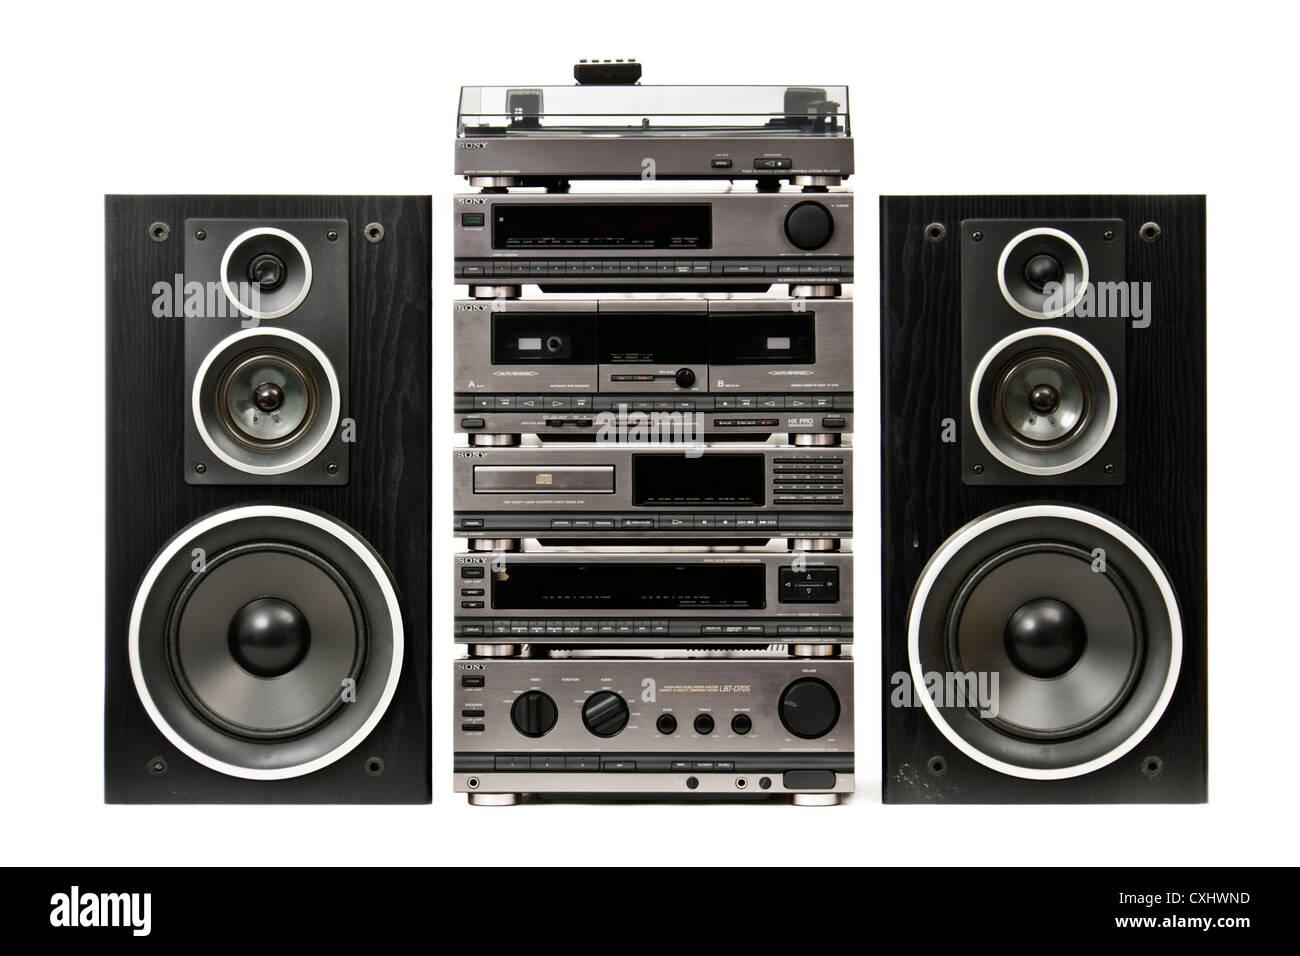 Vintage Sony Lbt D705 Integrated Hi Fi Music System Stock